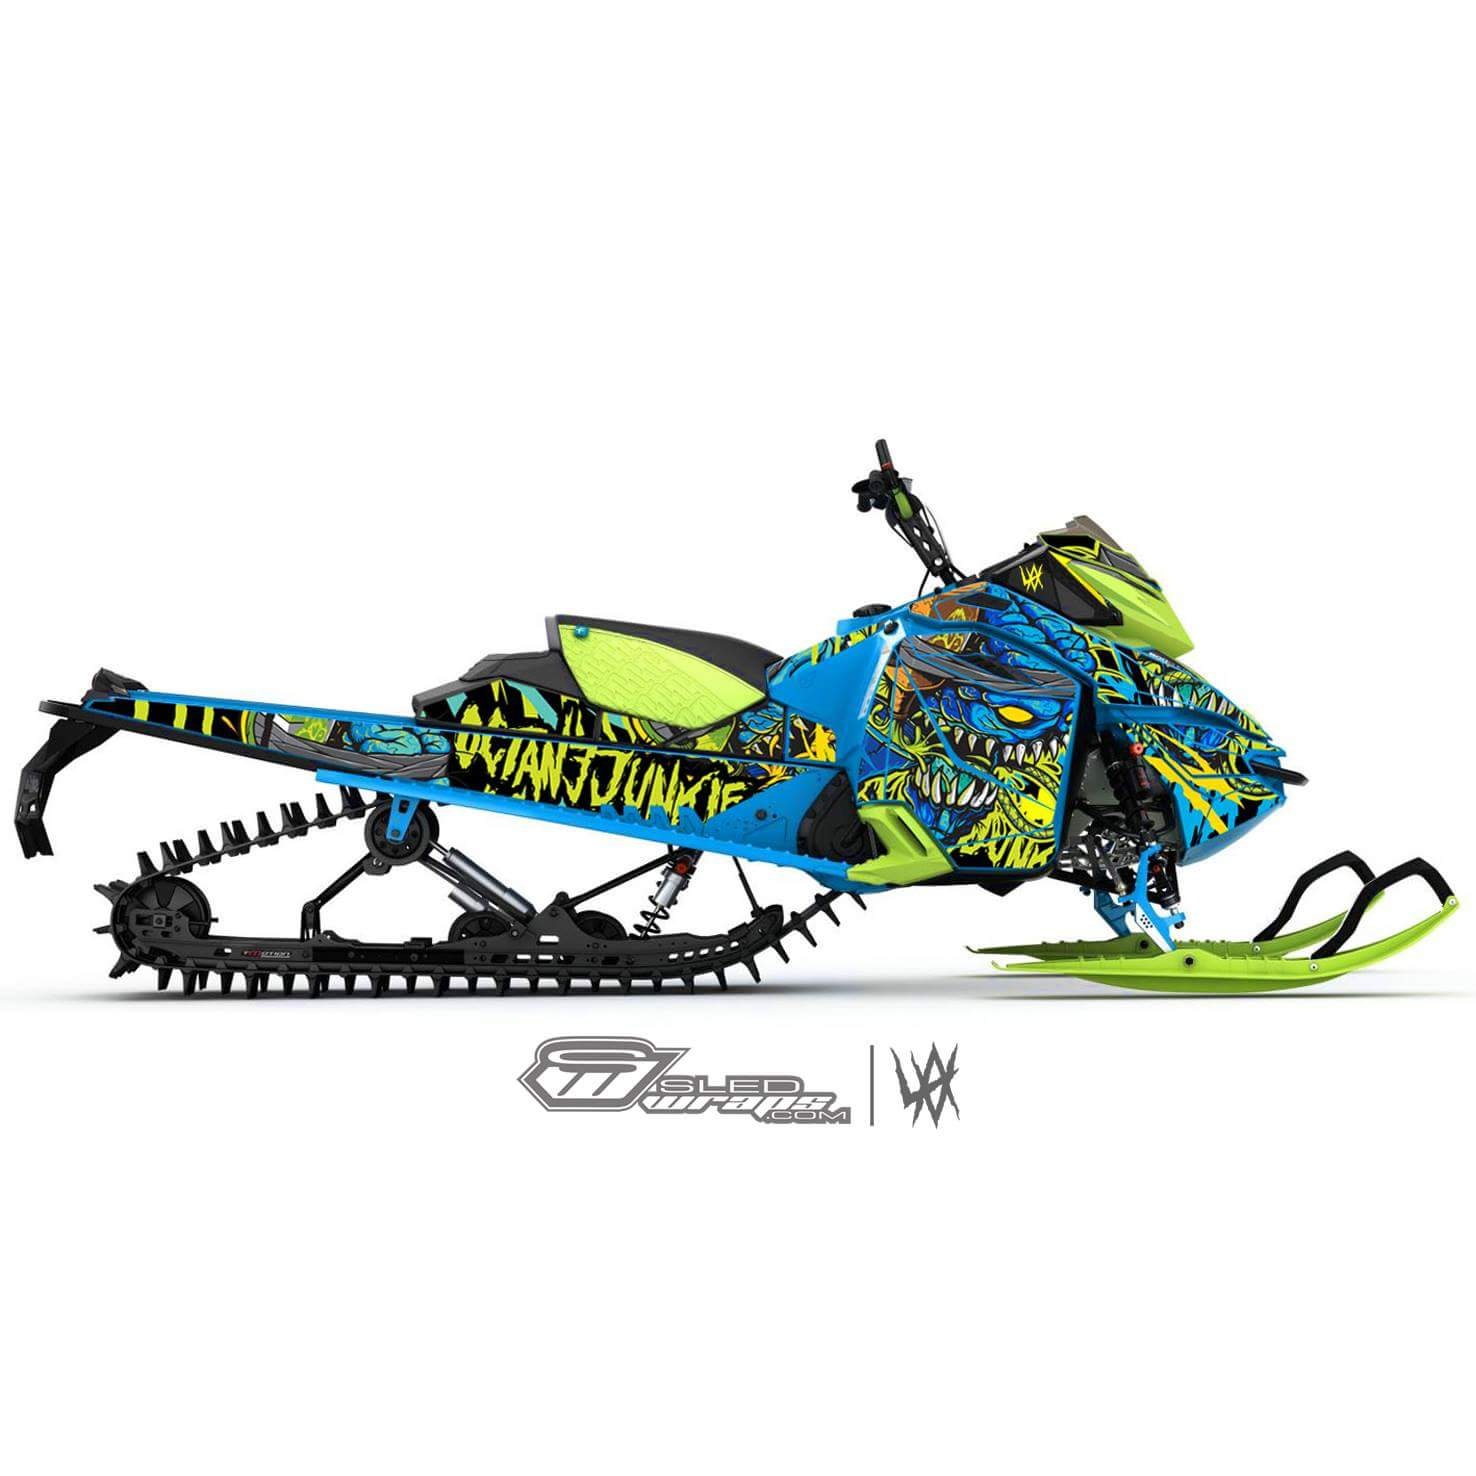 1476x1476 Leif Alvarsson Art The New 2017 @skidooofficial Freeride!!! Get